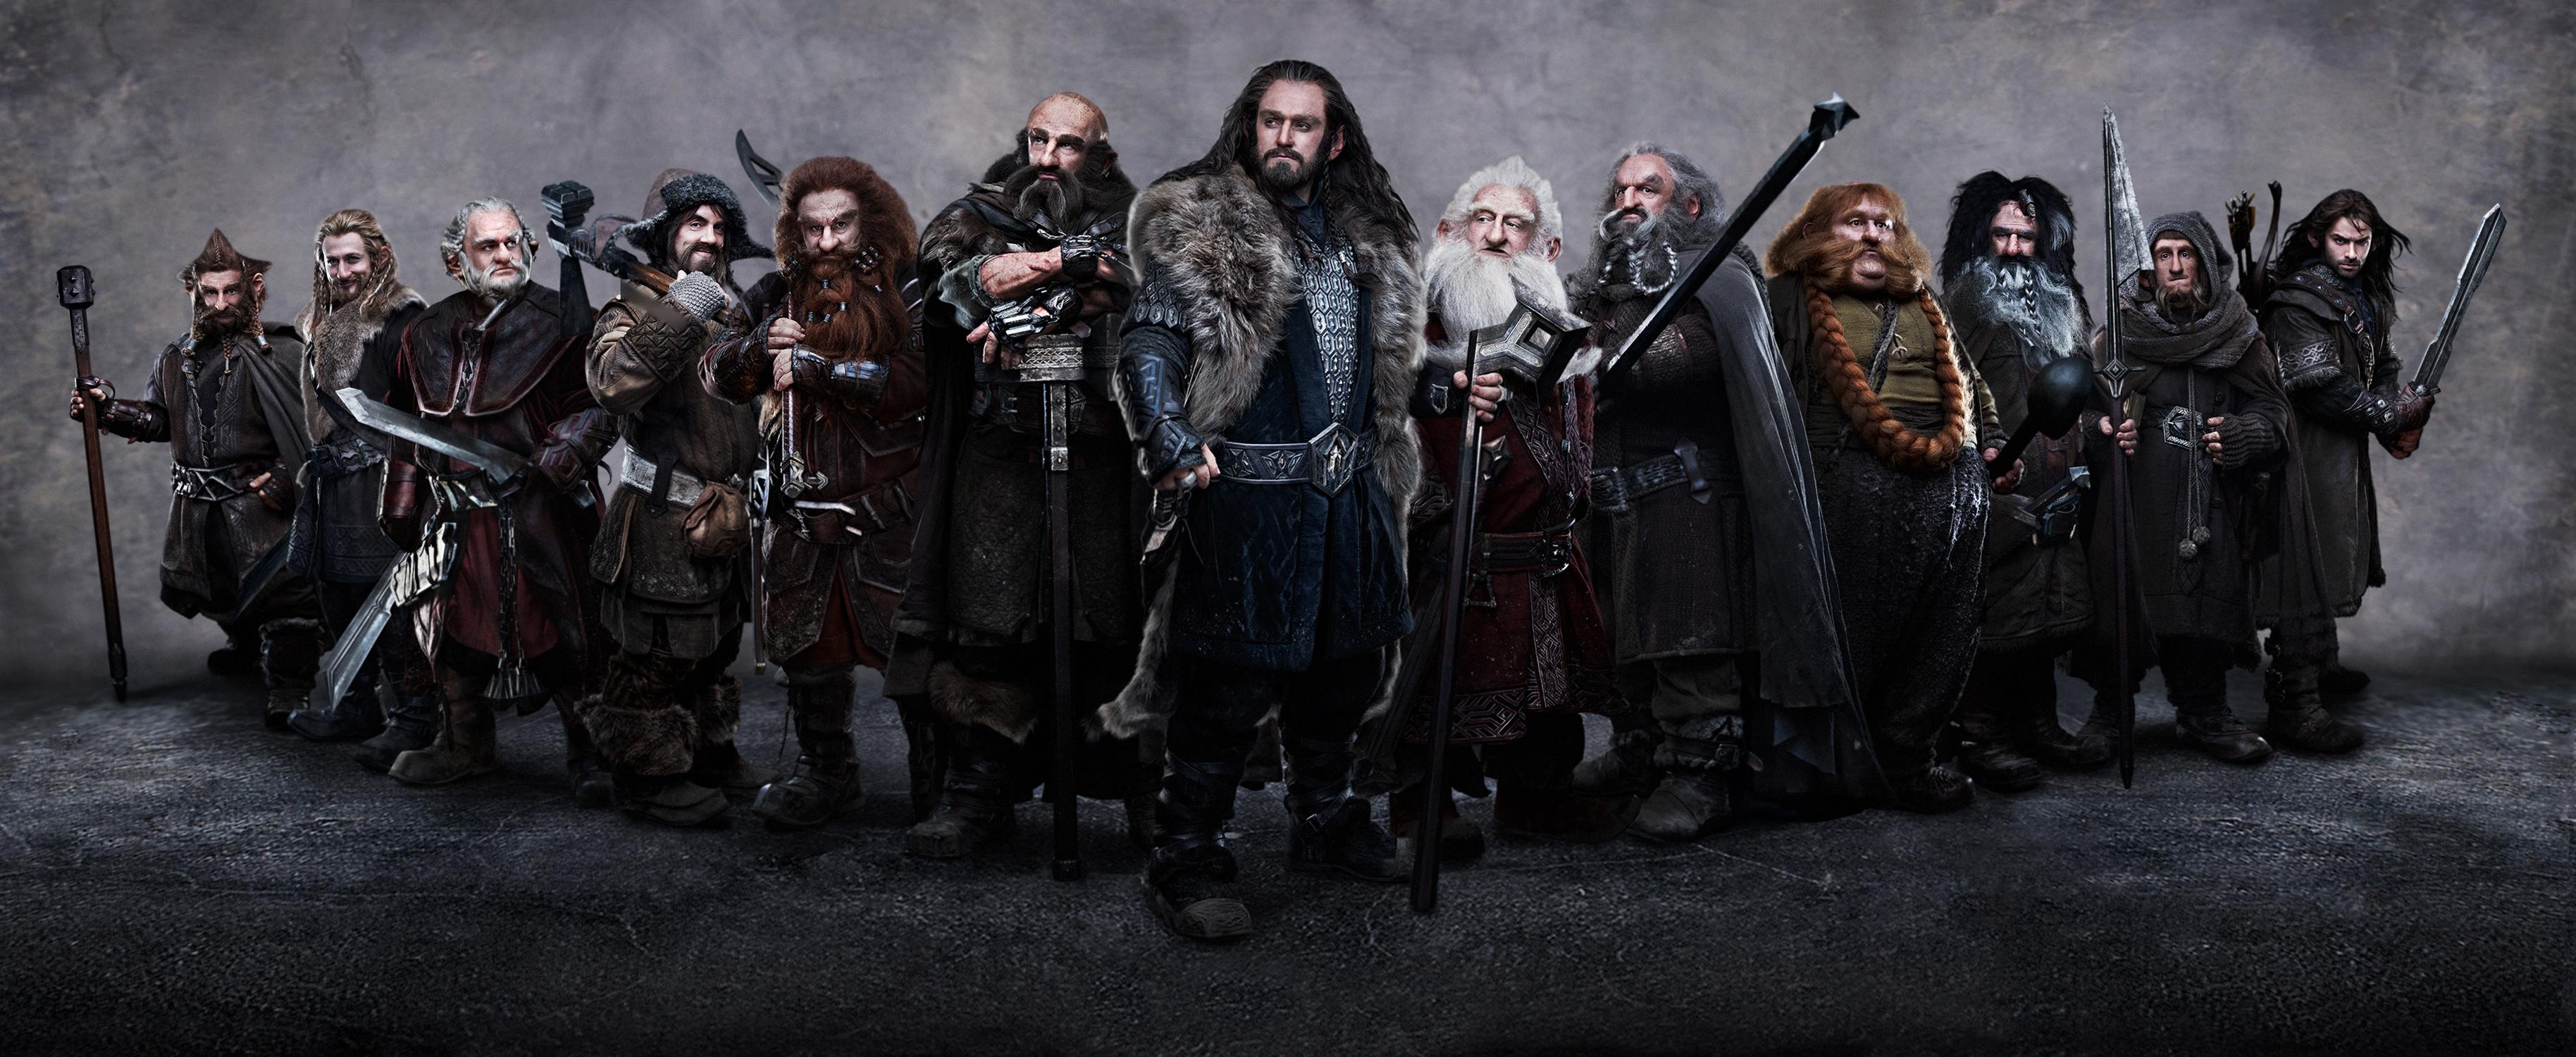 Thorin & Co.